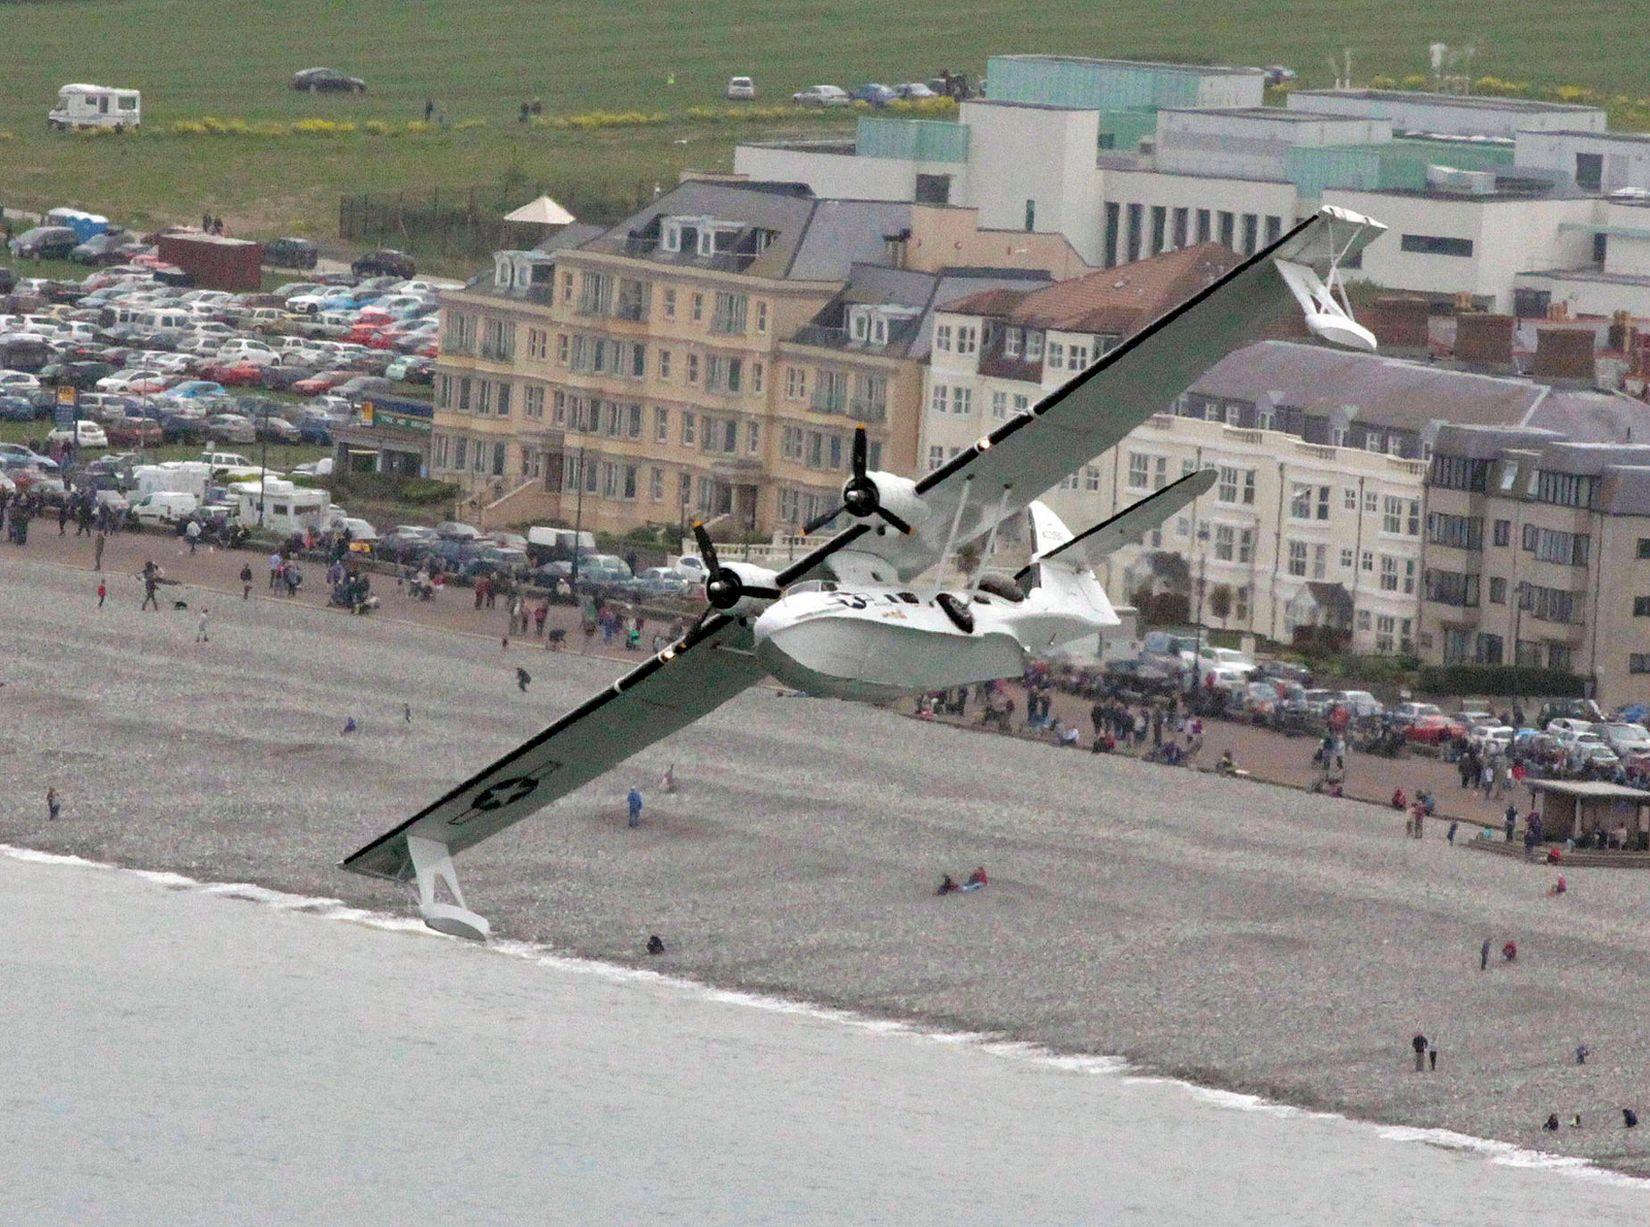 Catalina C Fnjf Sea Plane Flying Over Llandudno Promenade